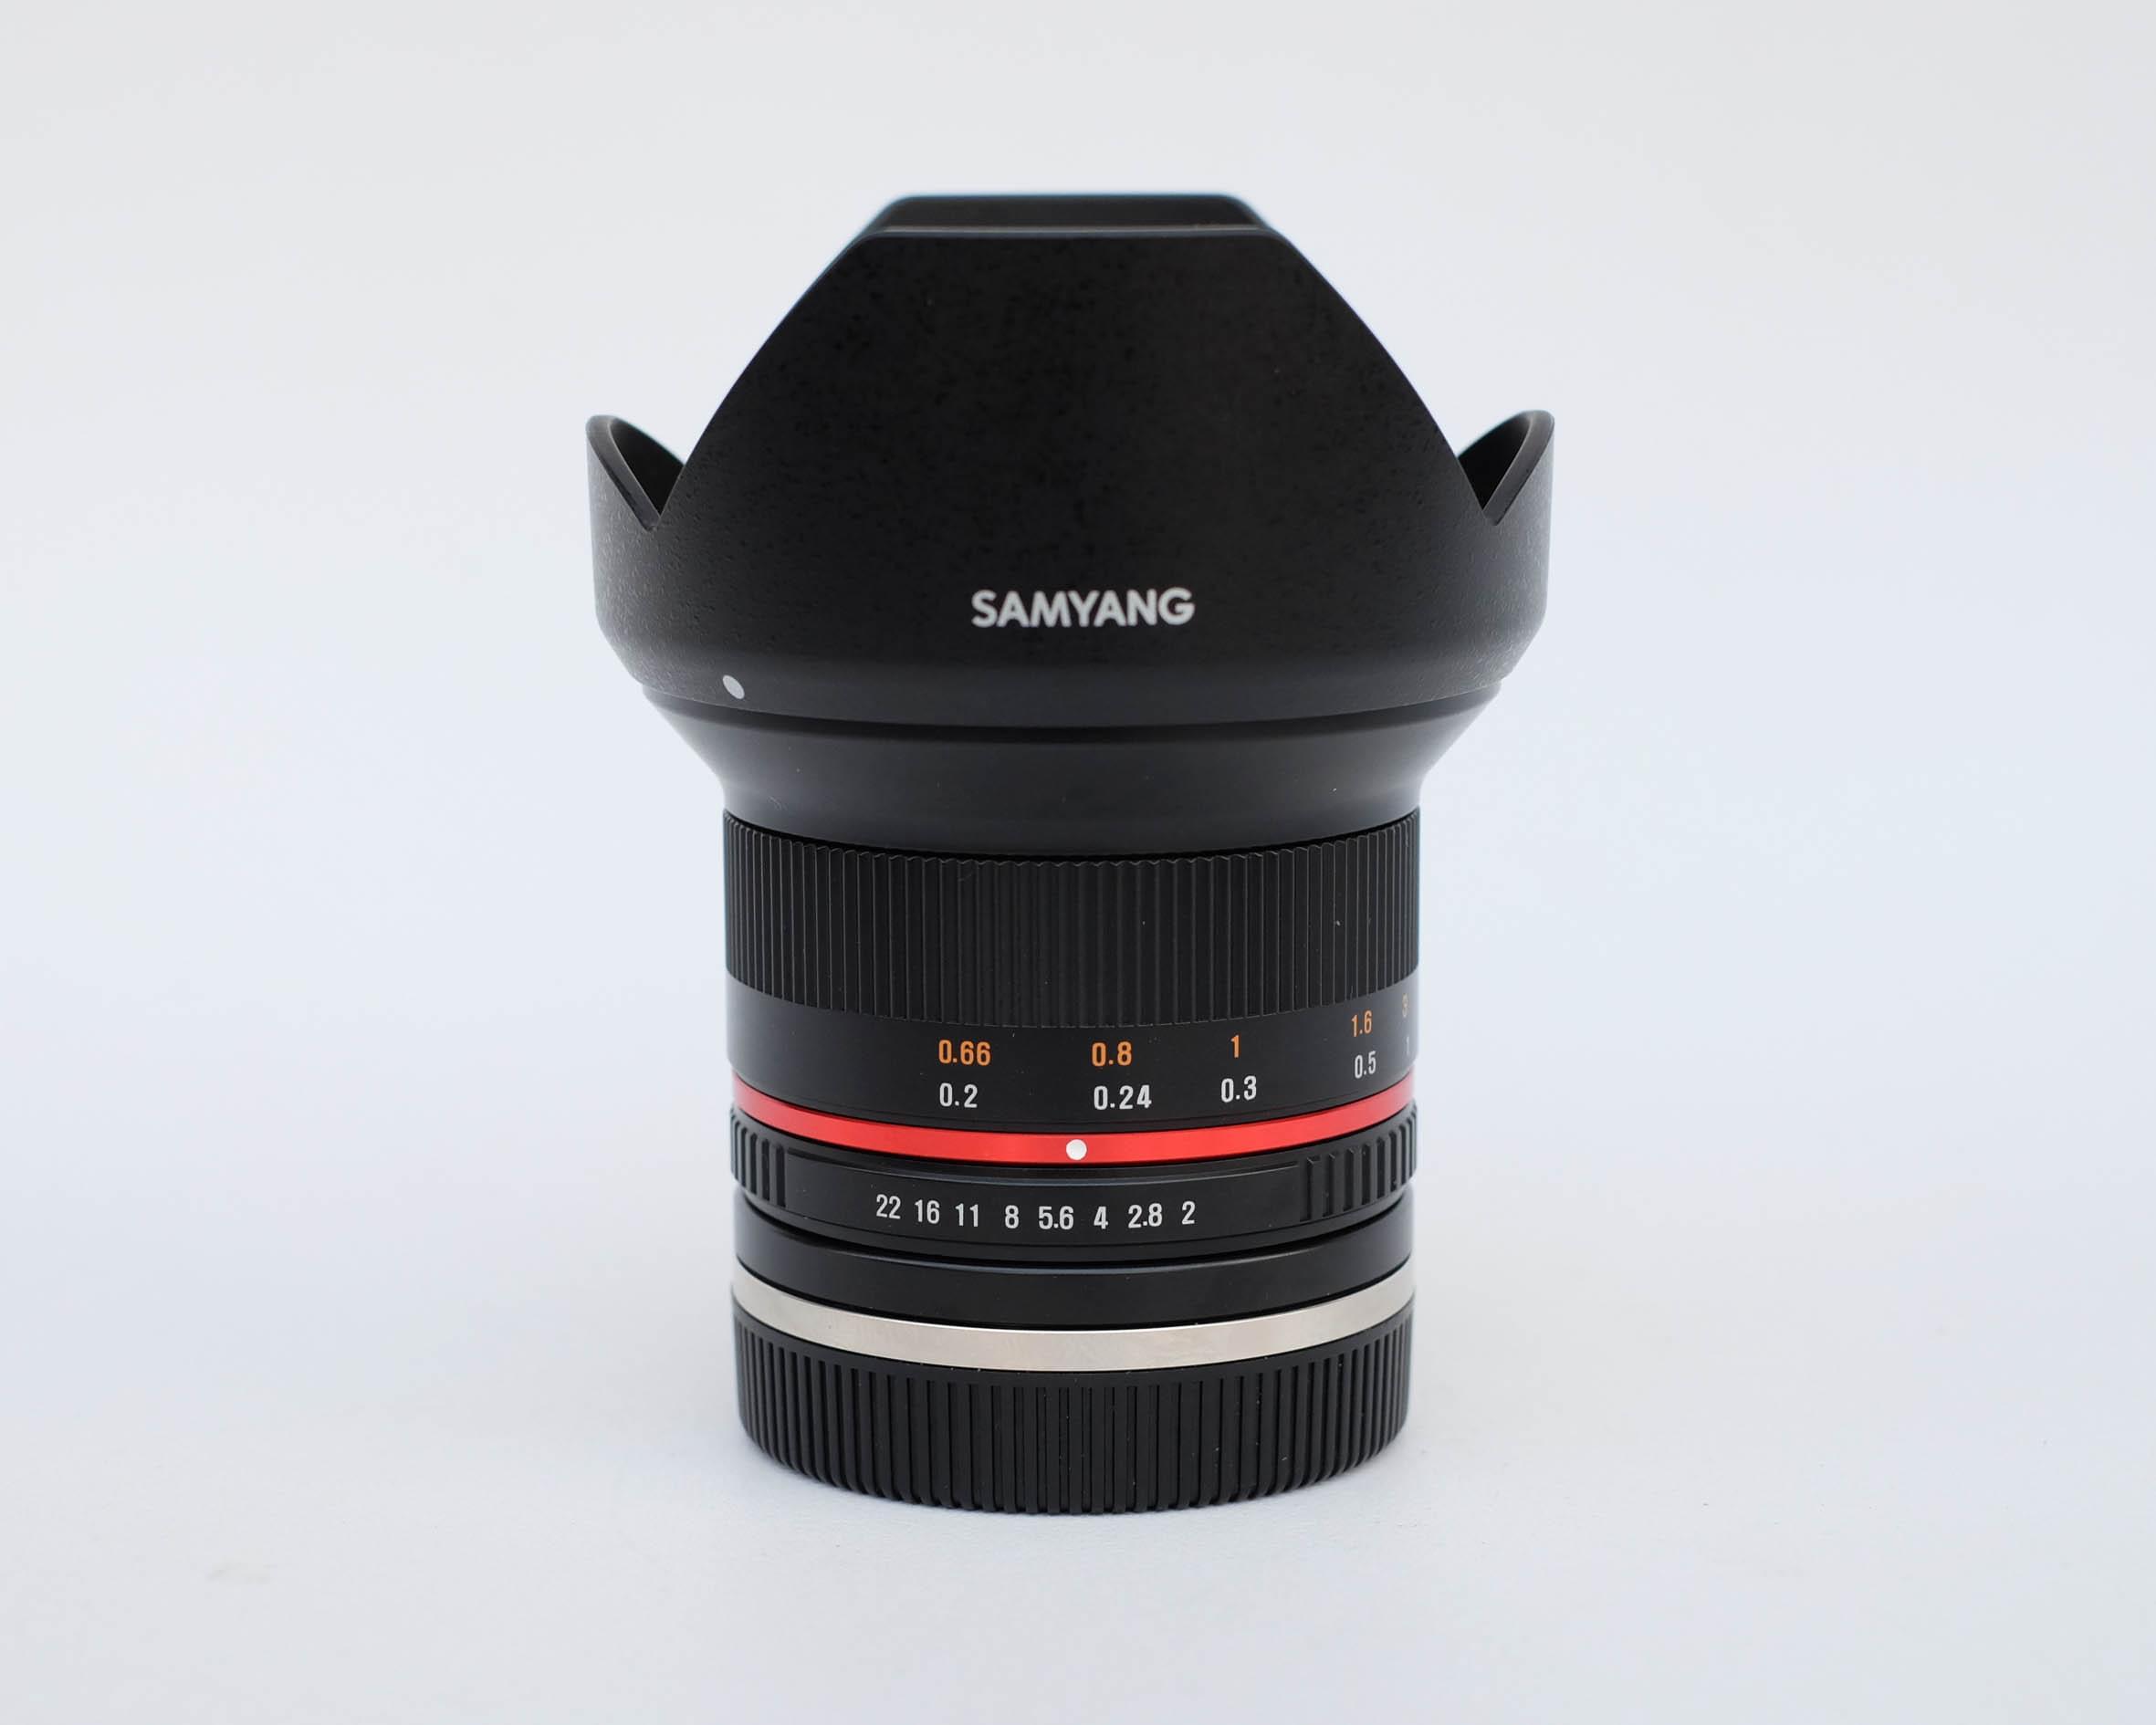 Samyang 12mm F2.0 for Sony Emount(Crop)